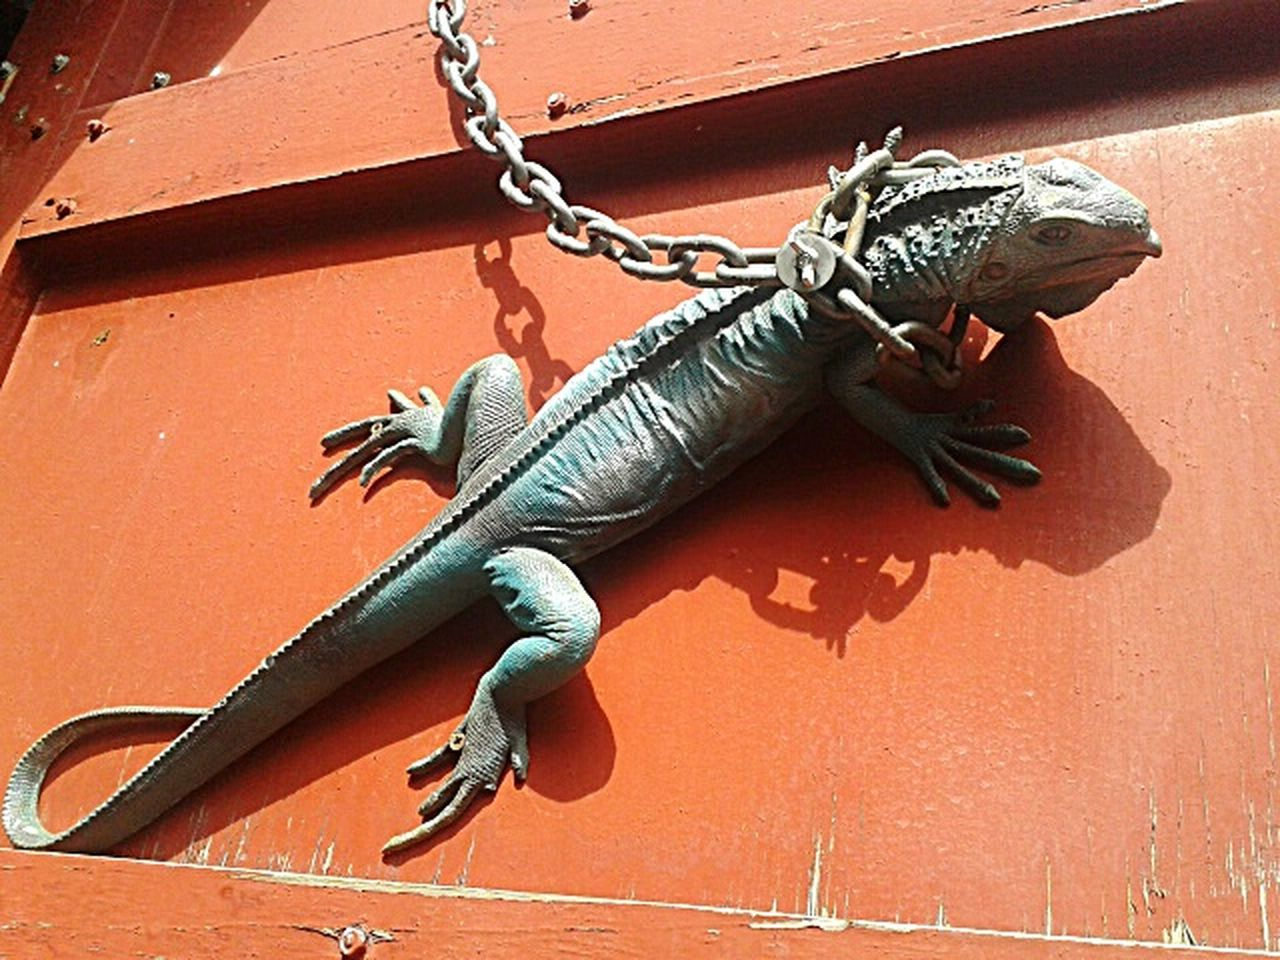 reptile, lizard, no people, day, one animal, iguana, animal wildlife, outdoors, animal themes, nature, close-up